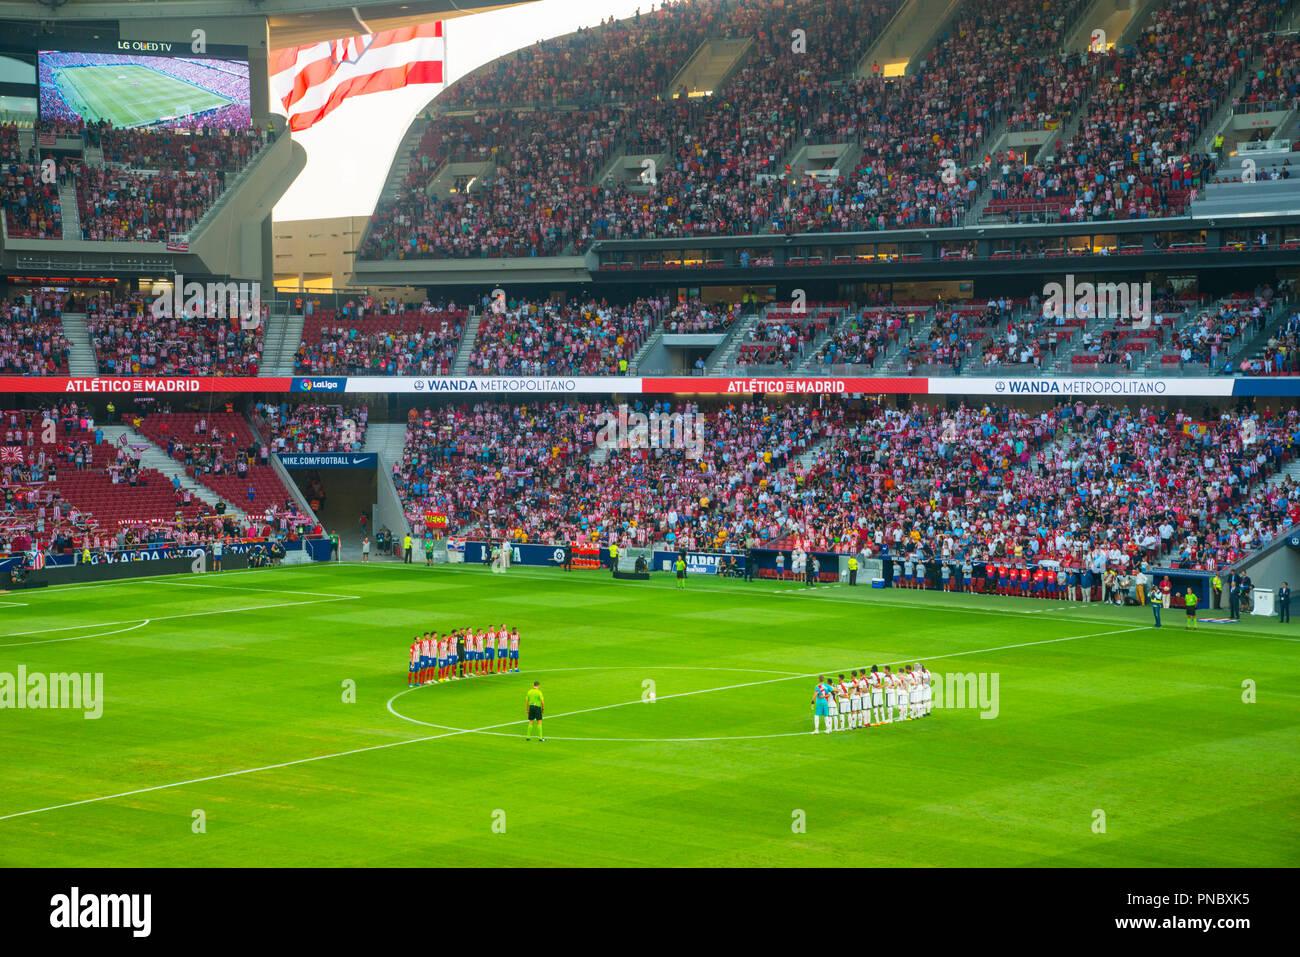 Moment of silence before a football match. Wanda Metropolitano stadium, Madrid, Spain. - Stock Image